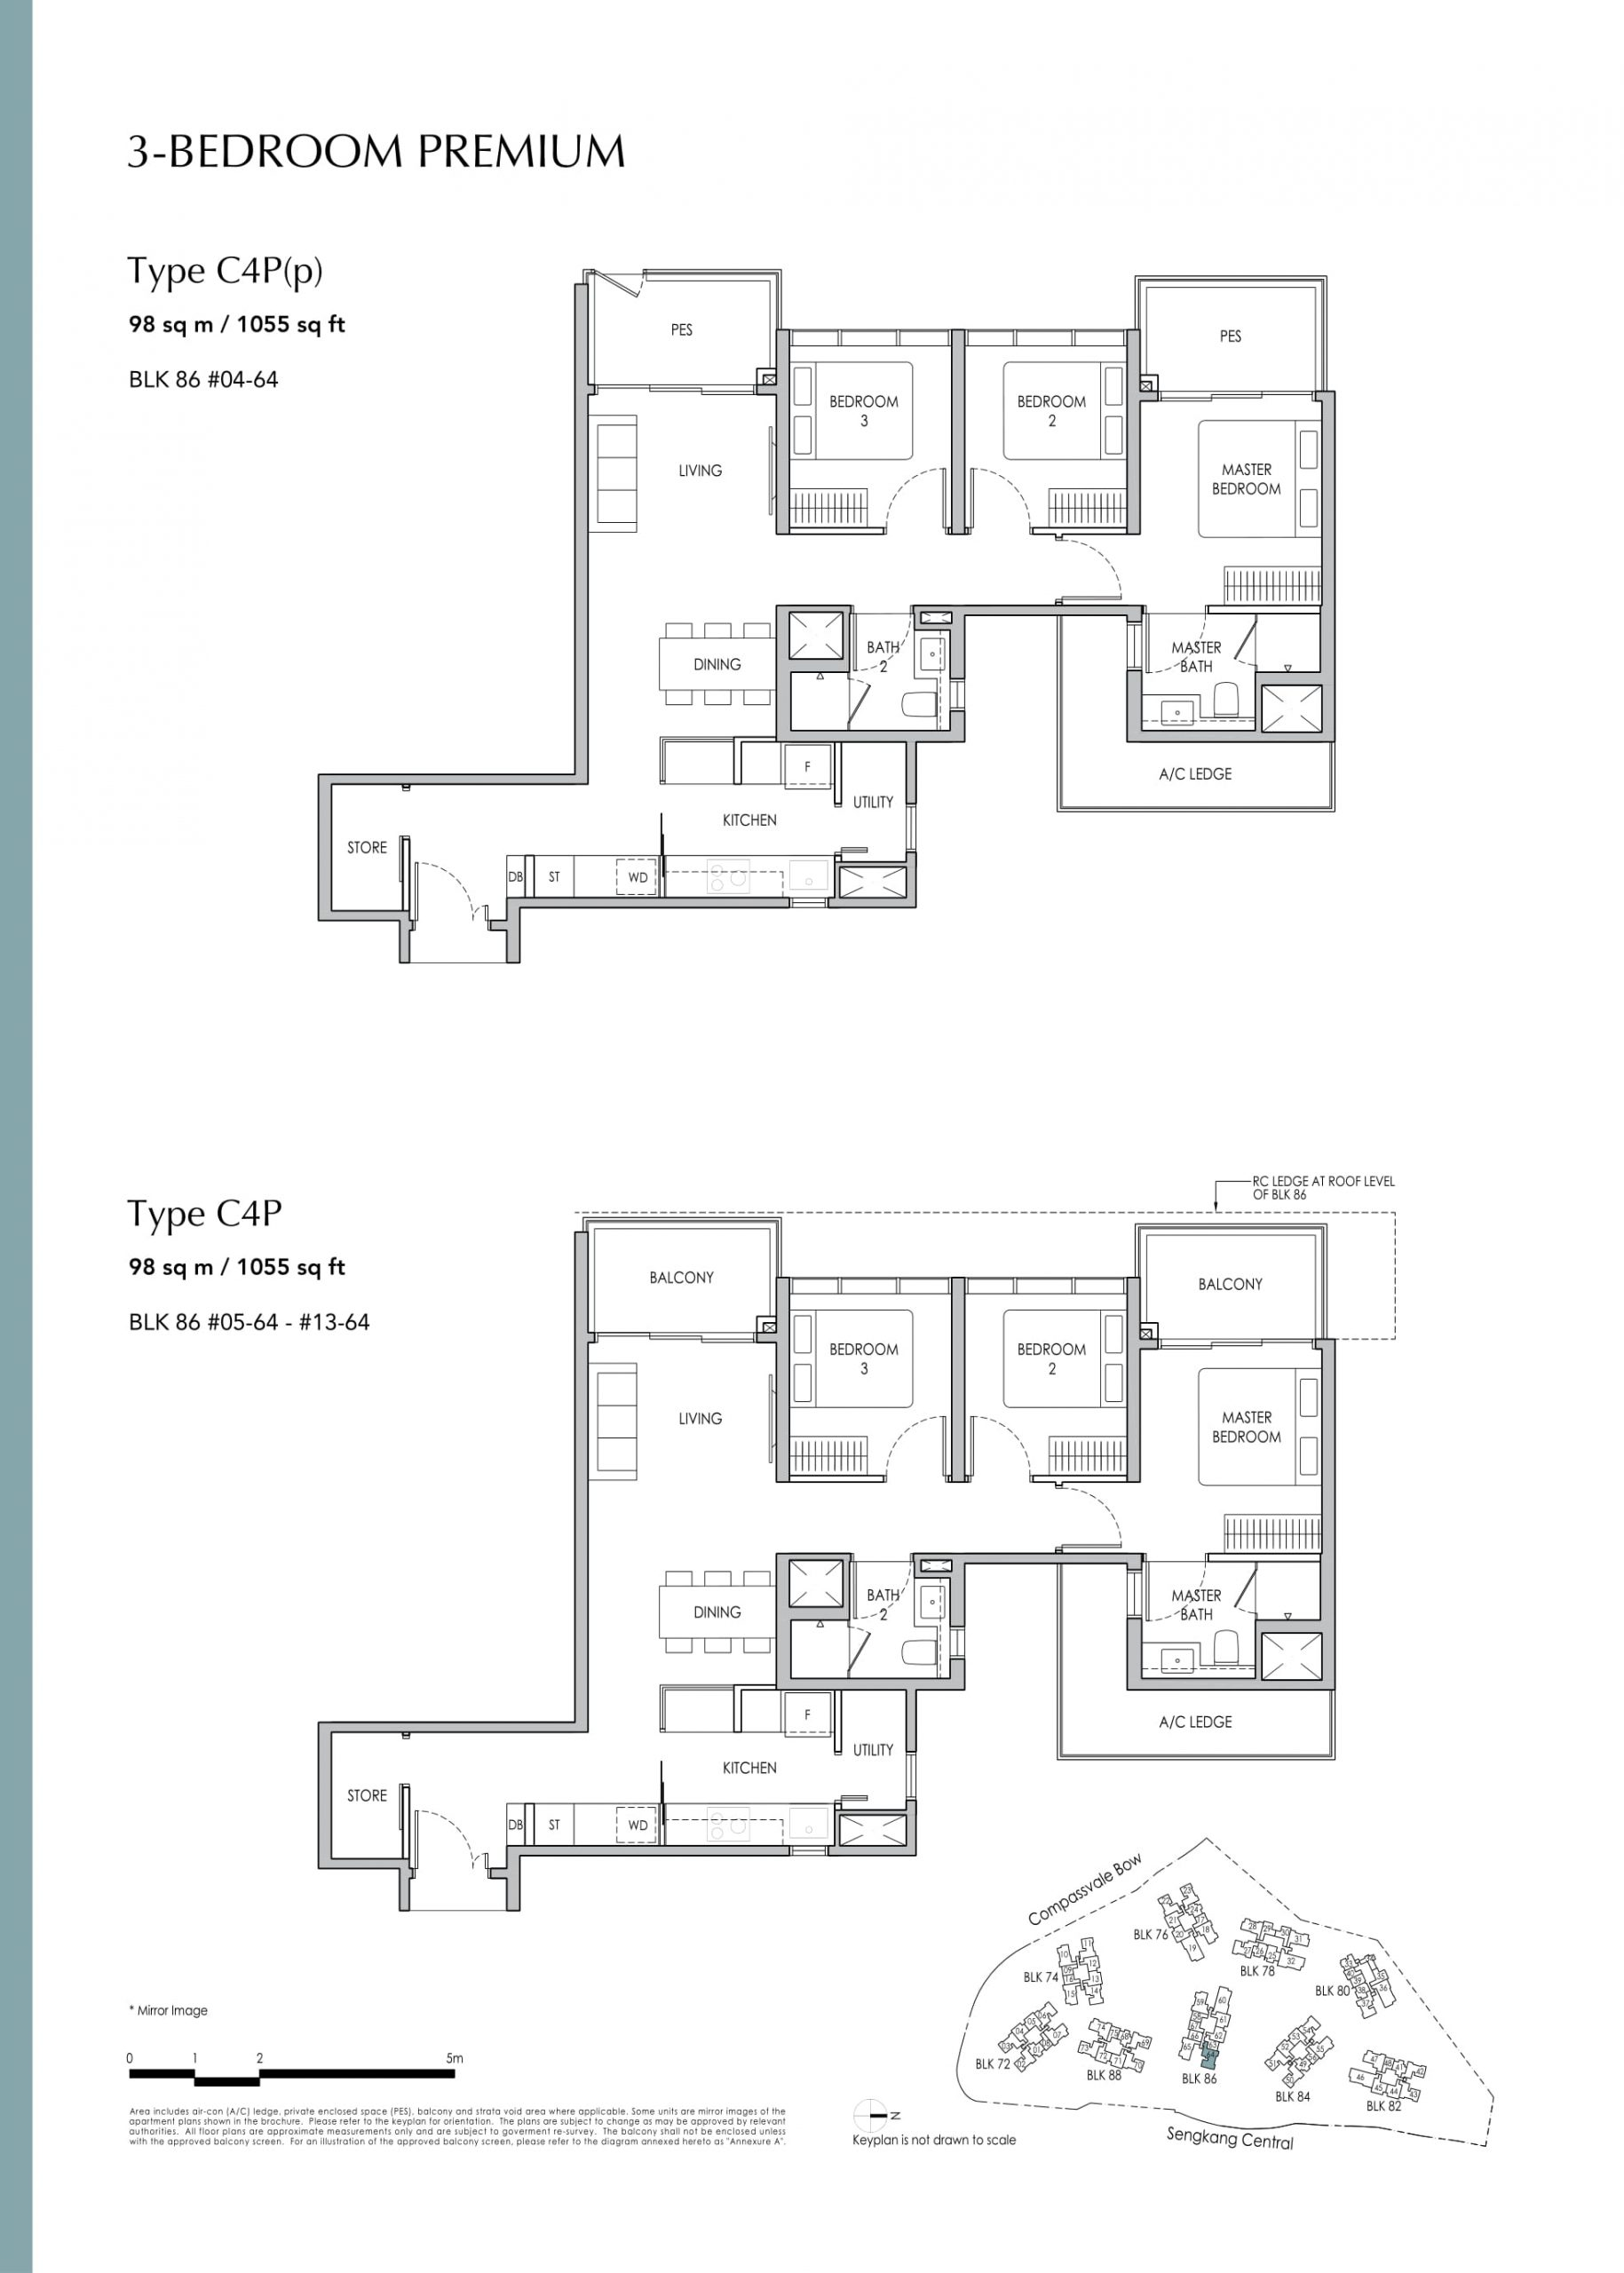 Sengkang Grand Residences' three-bedroom premium / + flexi types